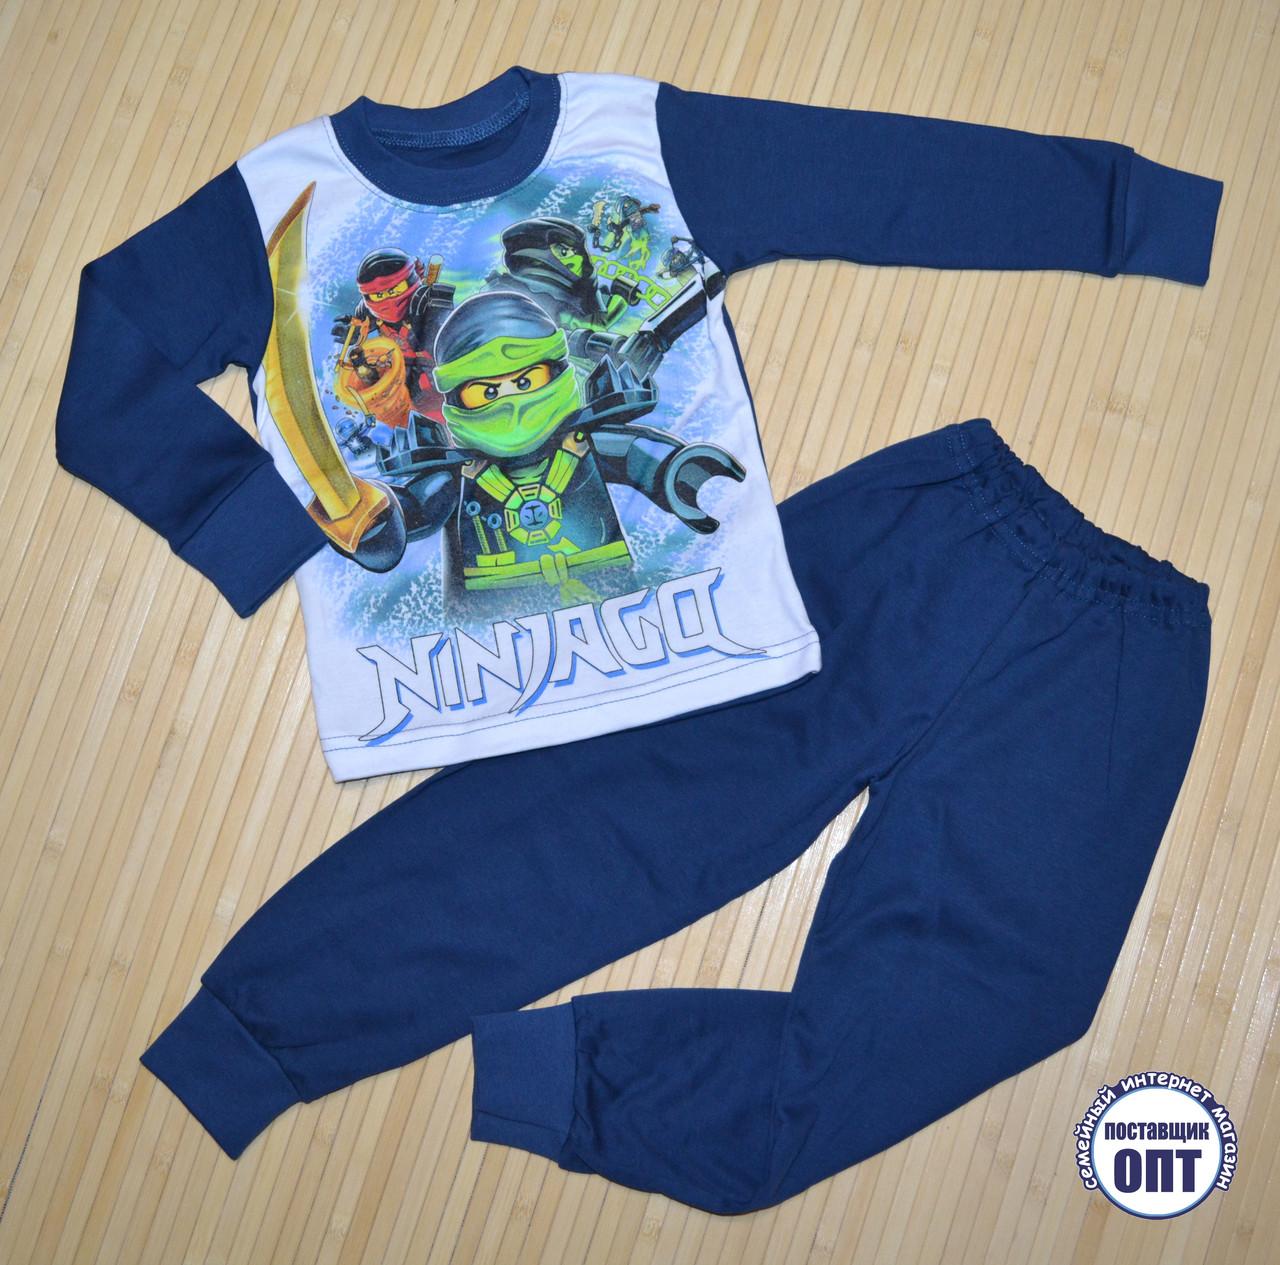 Пижама нинзяги размеры на 2-7 лет